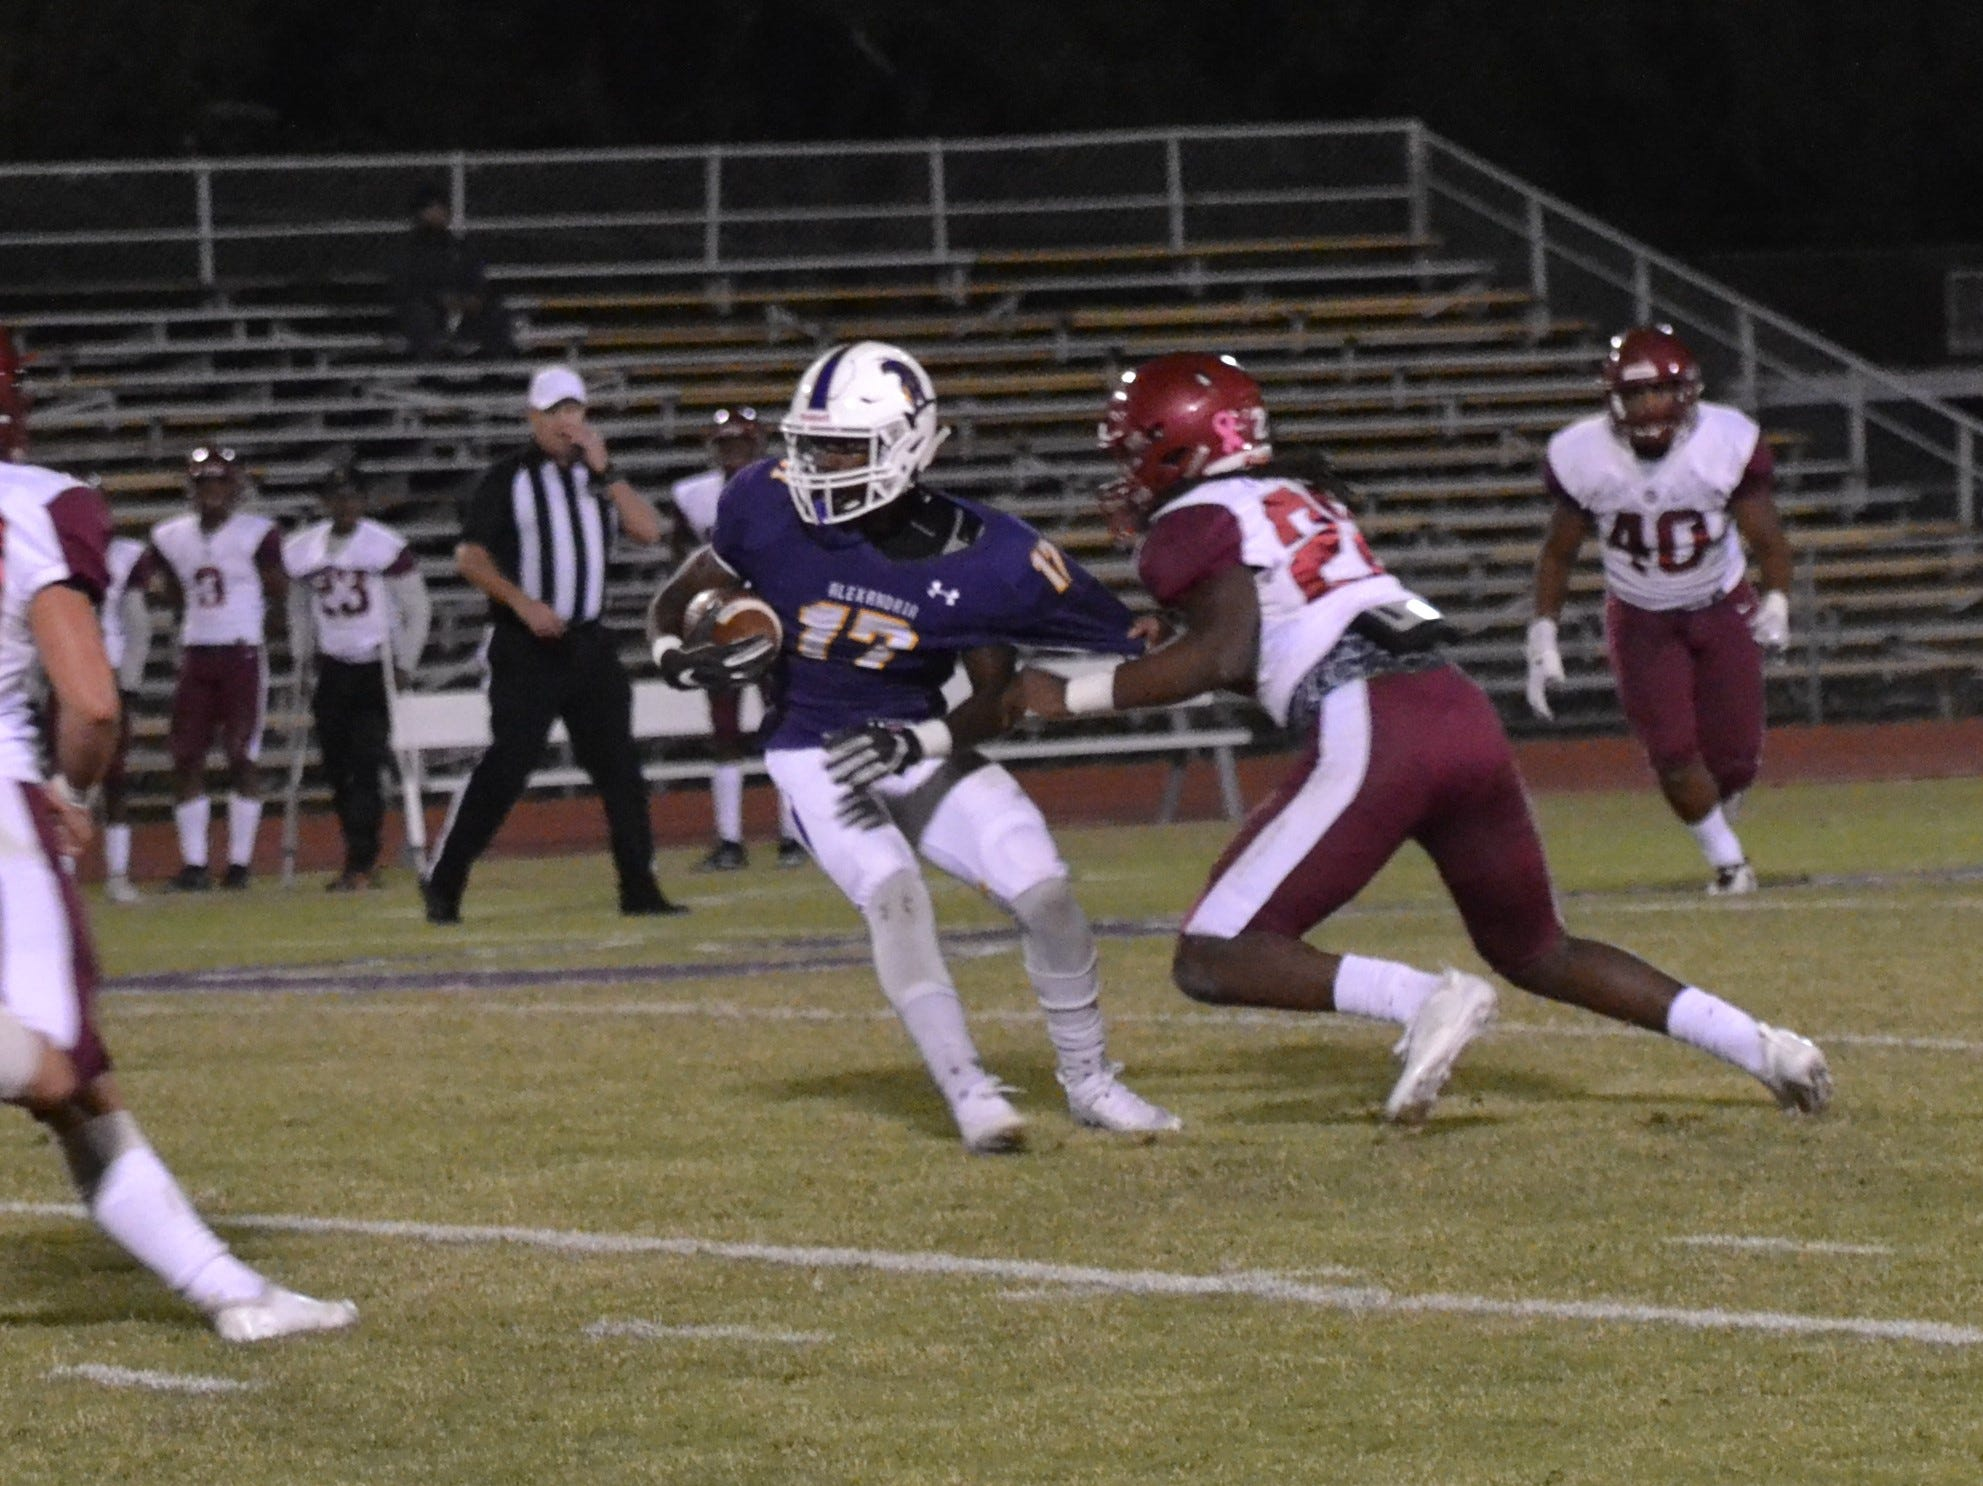 Ouachita defender Elijah Hall (22) tries to make a jersey tackle on ASH wide receiver Darrald More (17). The ASH Trojans fell to the Ouachita Parish Lions 42-20 Thursday, Nov. 1, at Alexandria Senior High.